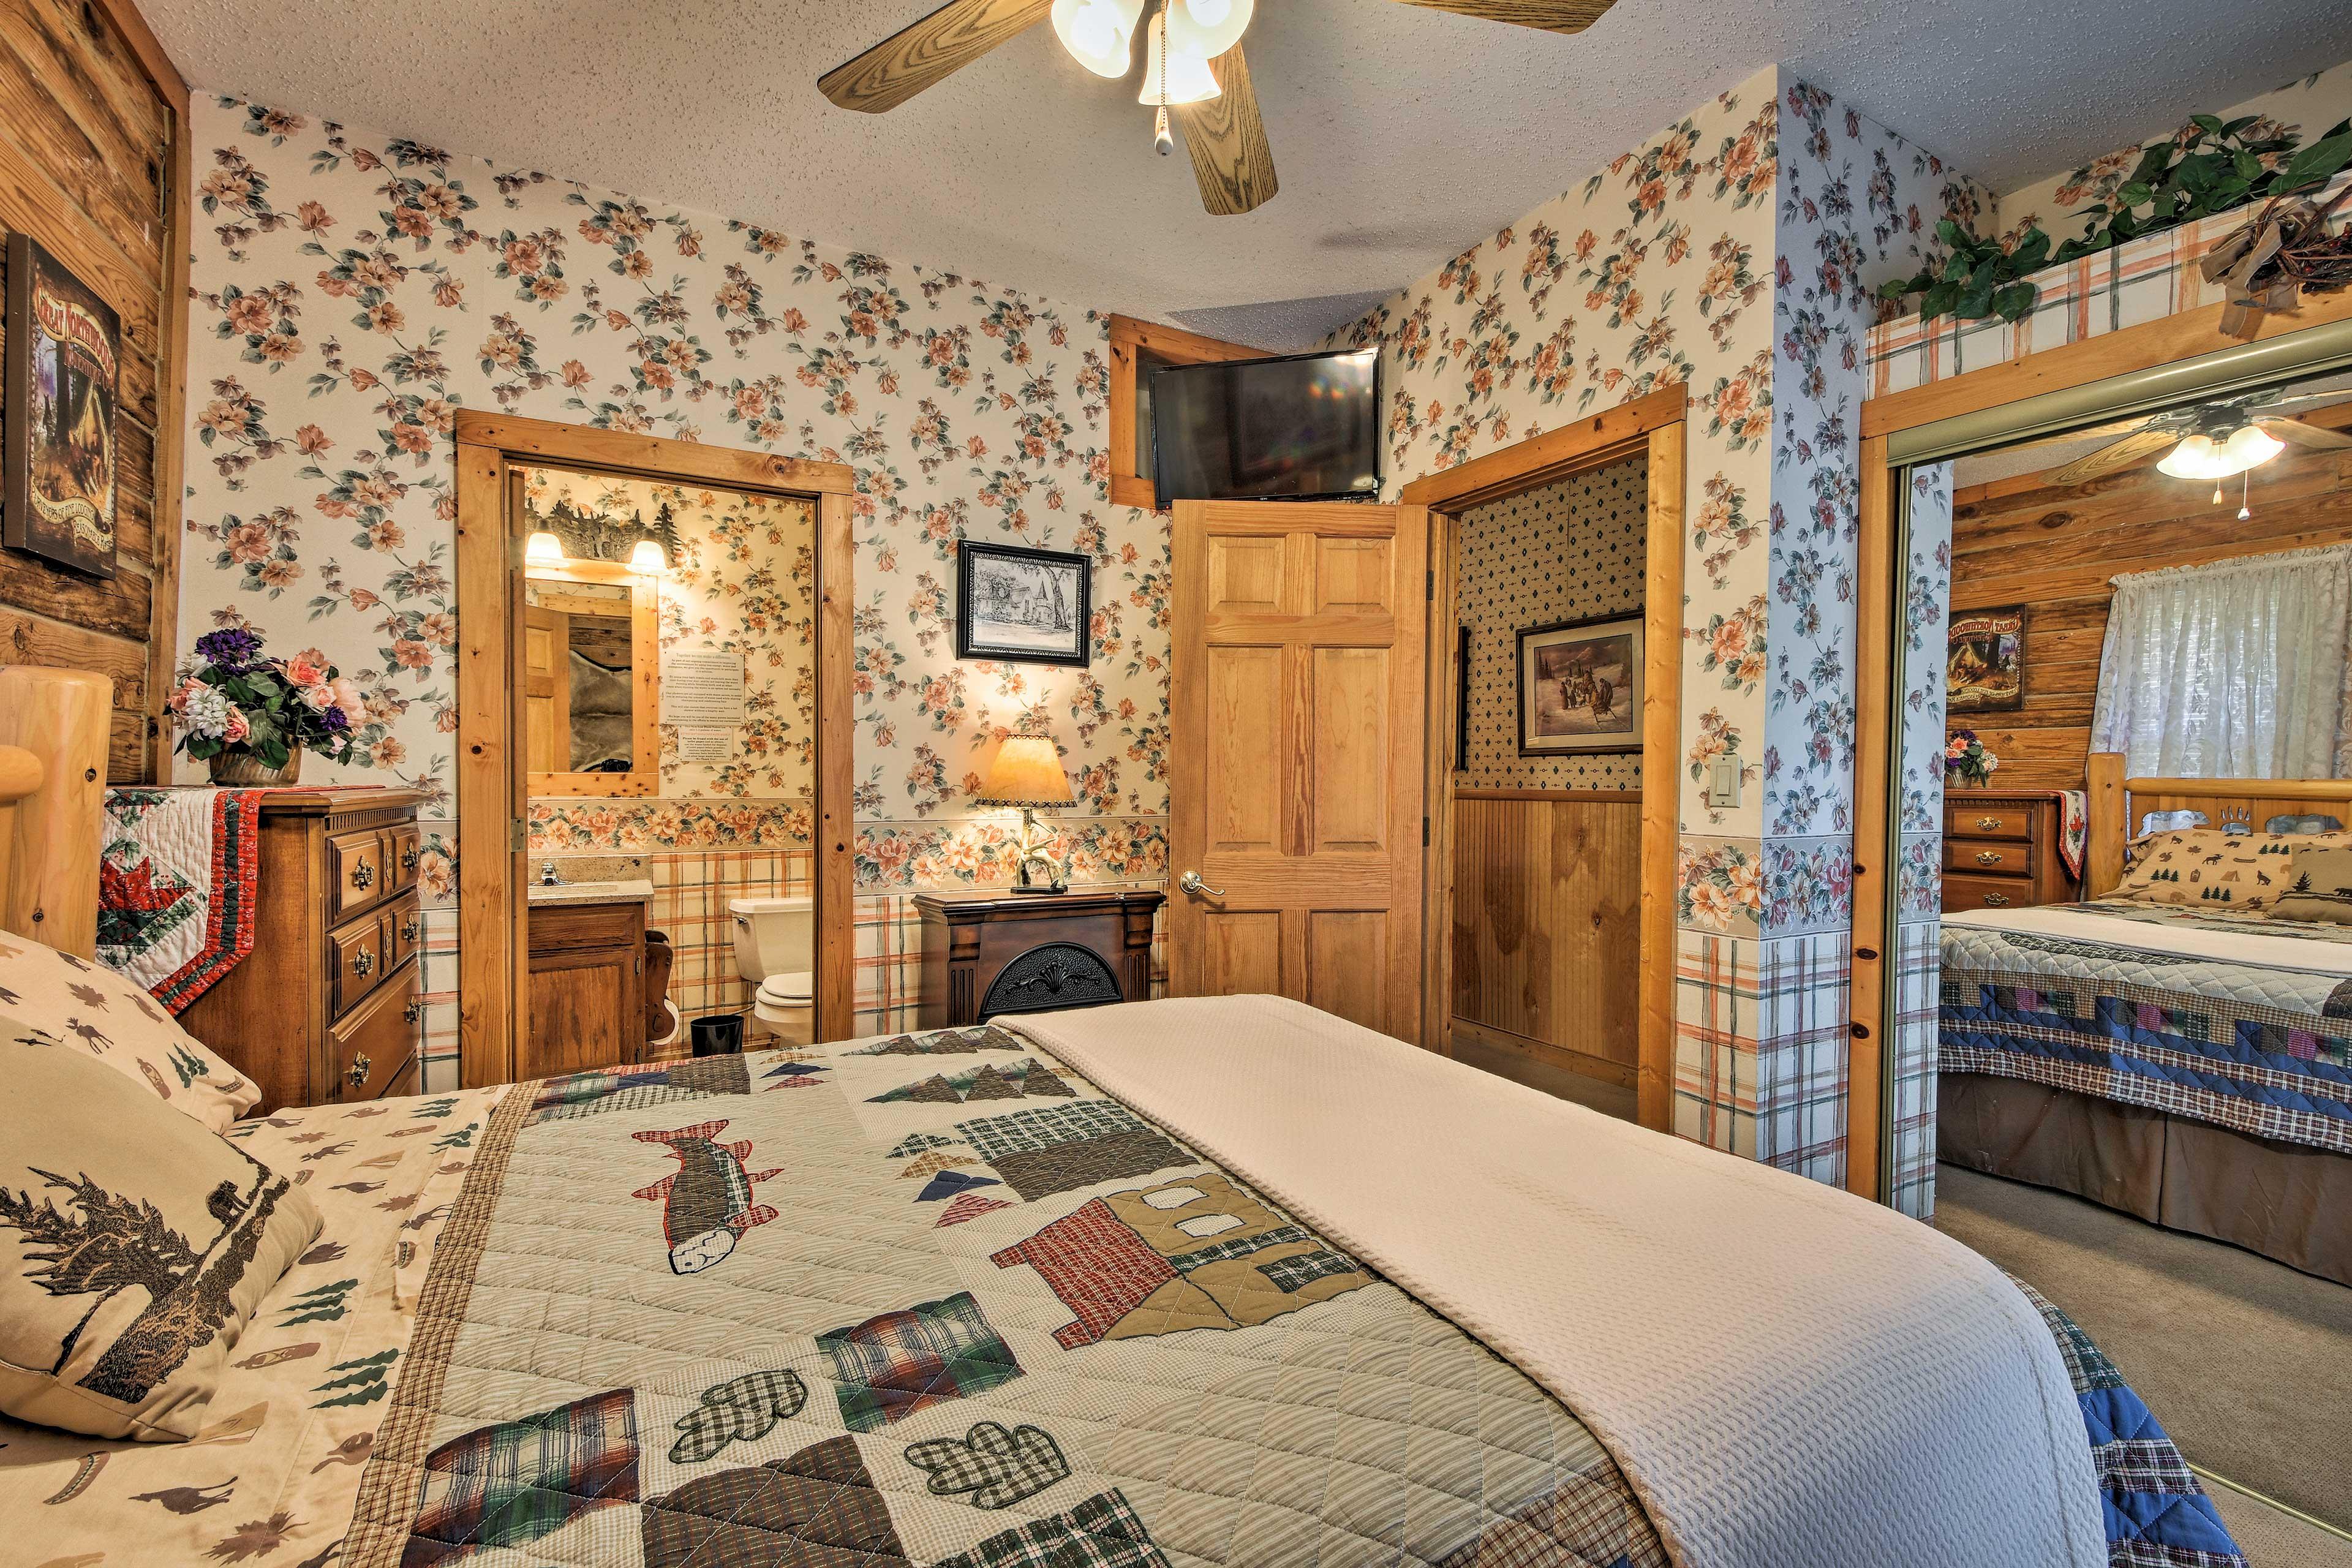 Enjoy privacy in this bedroom's en-suite bathroom!